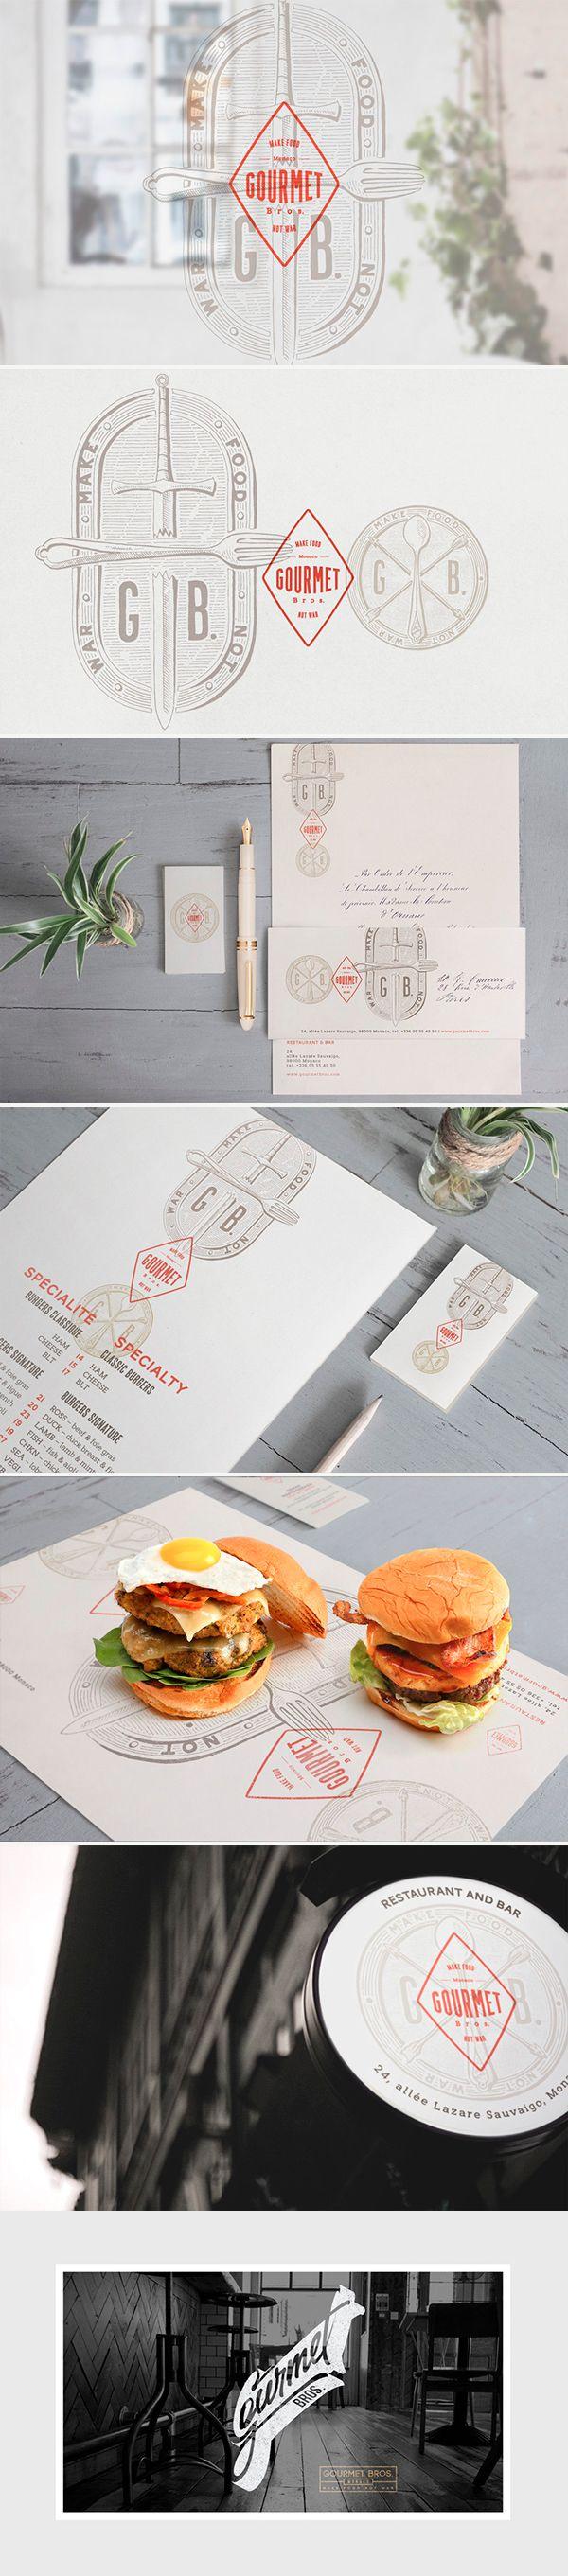 identity / gourmet bros. / restaurant